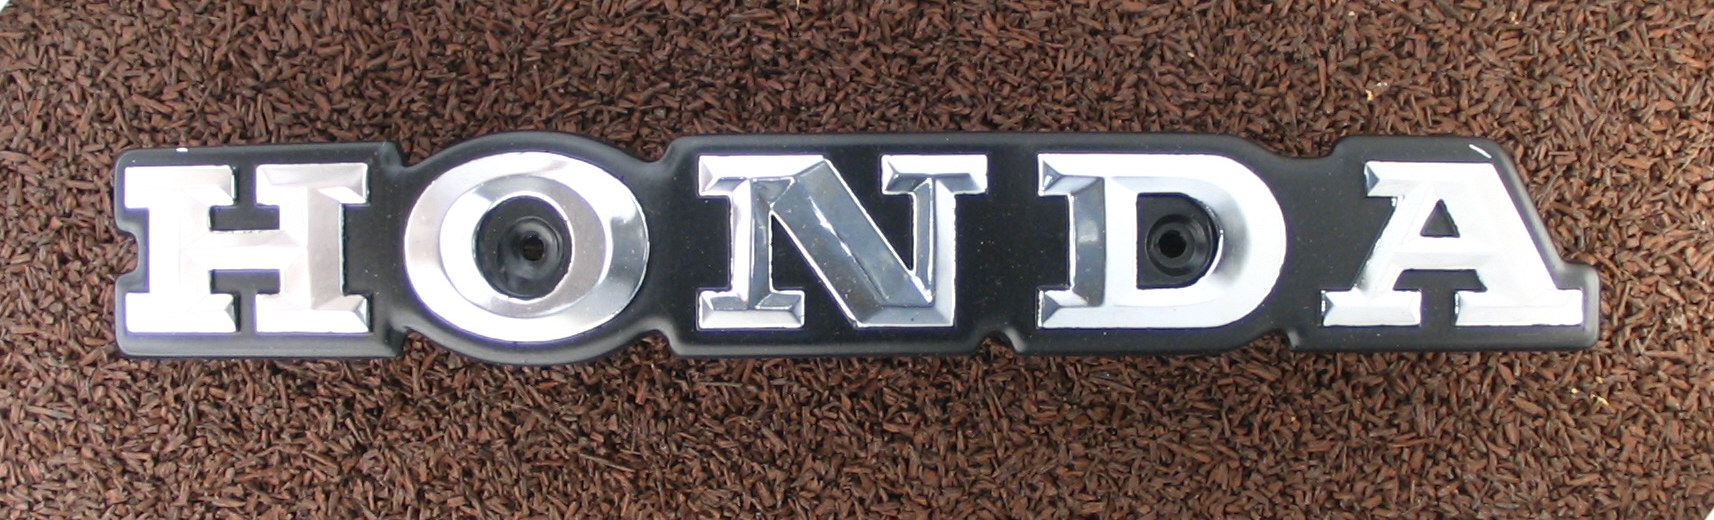 HONDA CX500 /'78 BADGE /'83  SIDE COVER EMBLEM